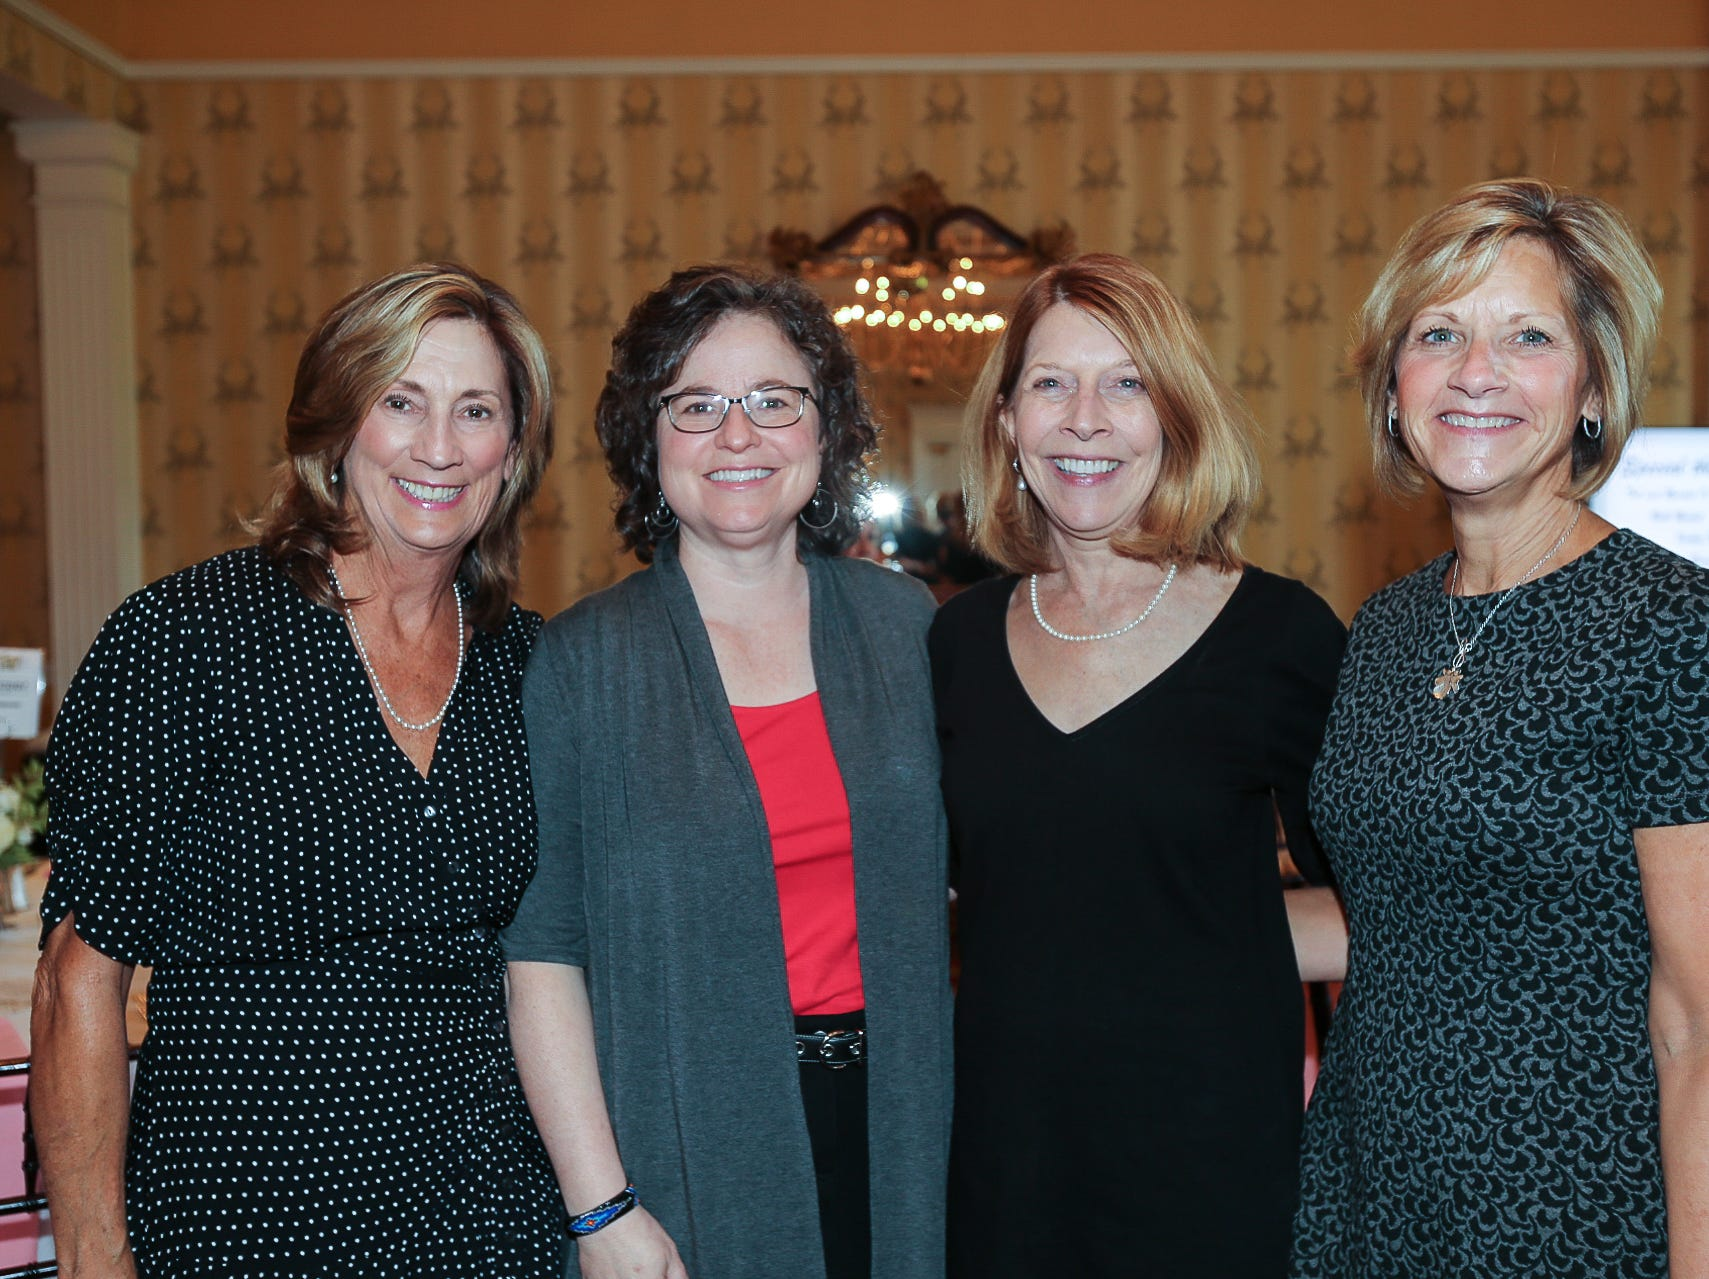 Susy Barr, Susan Essman, Terri Libel, and Kristy Bowenschultz